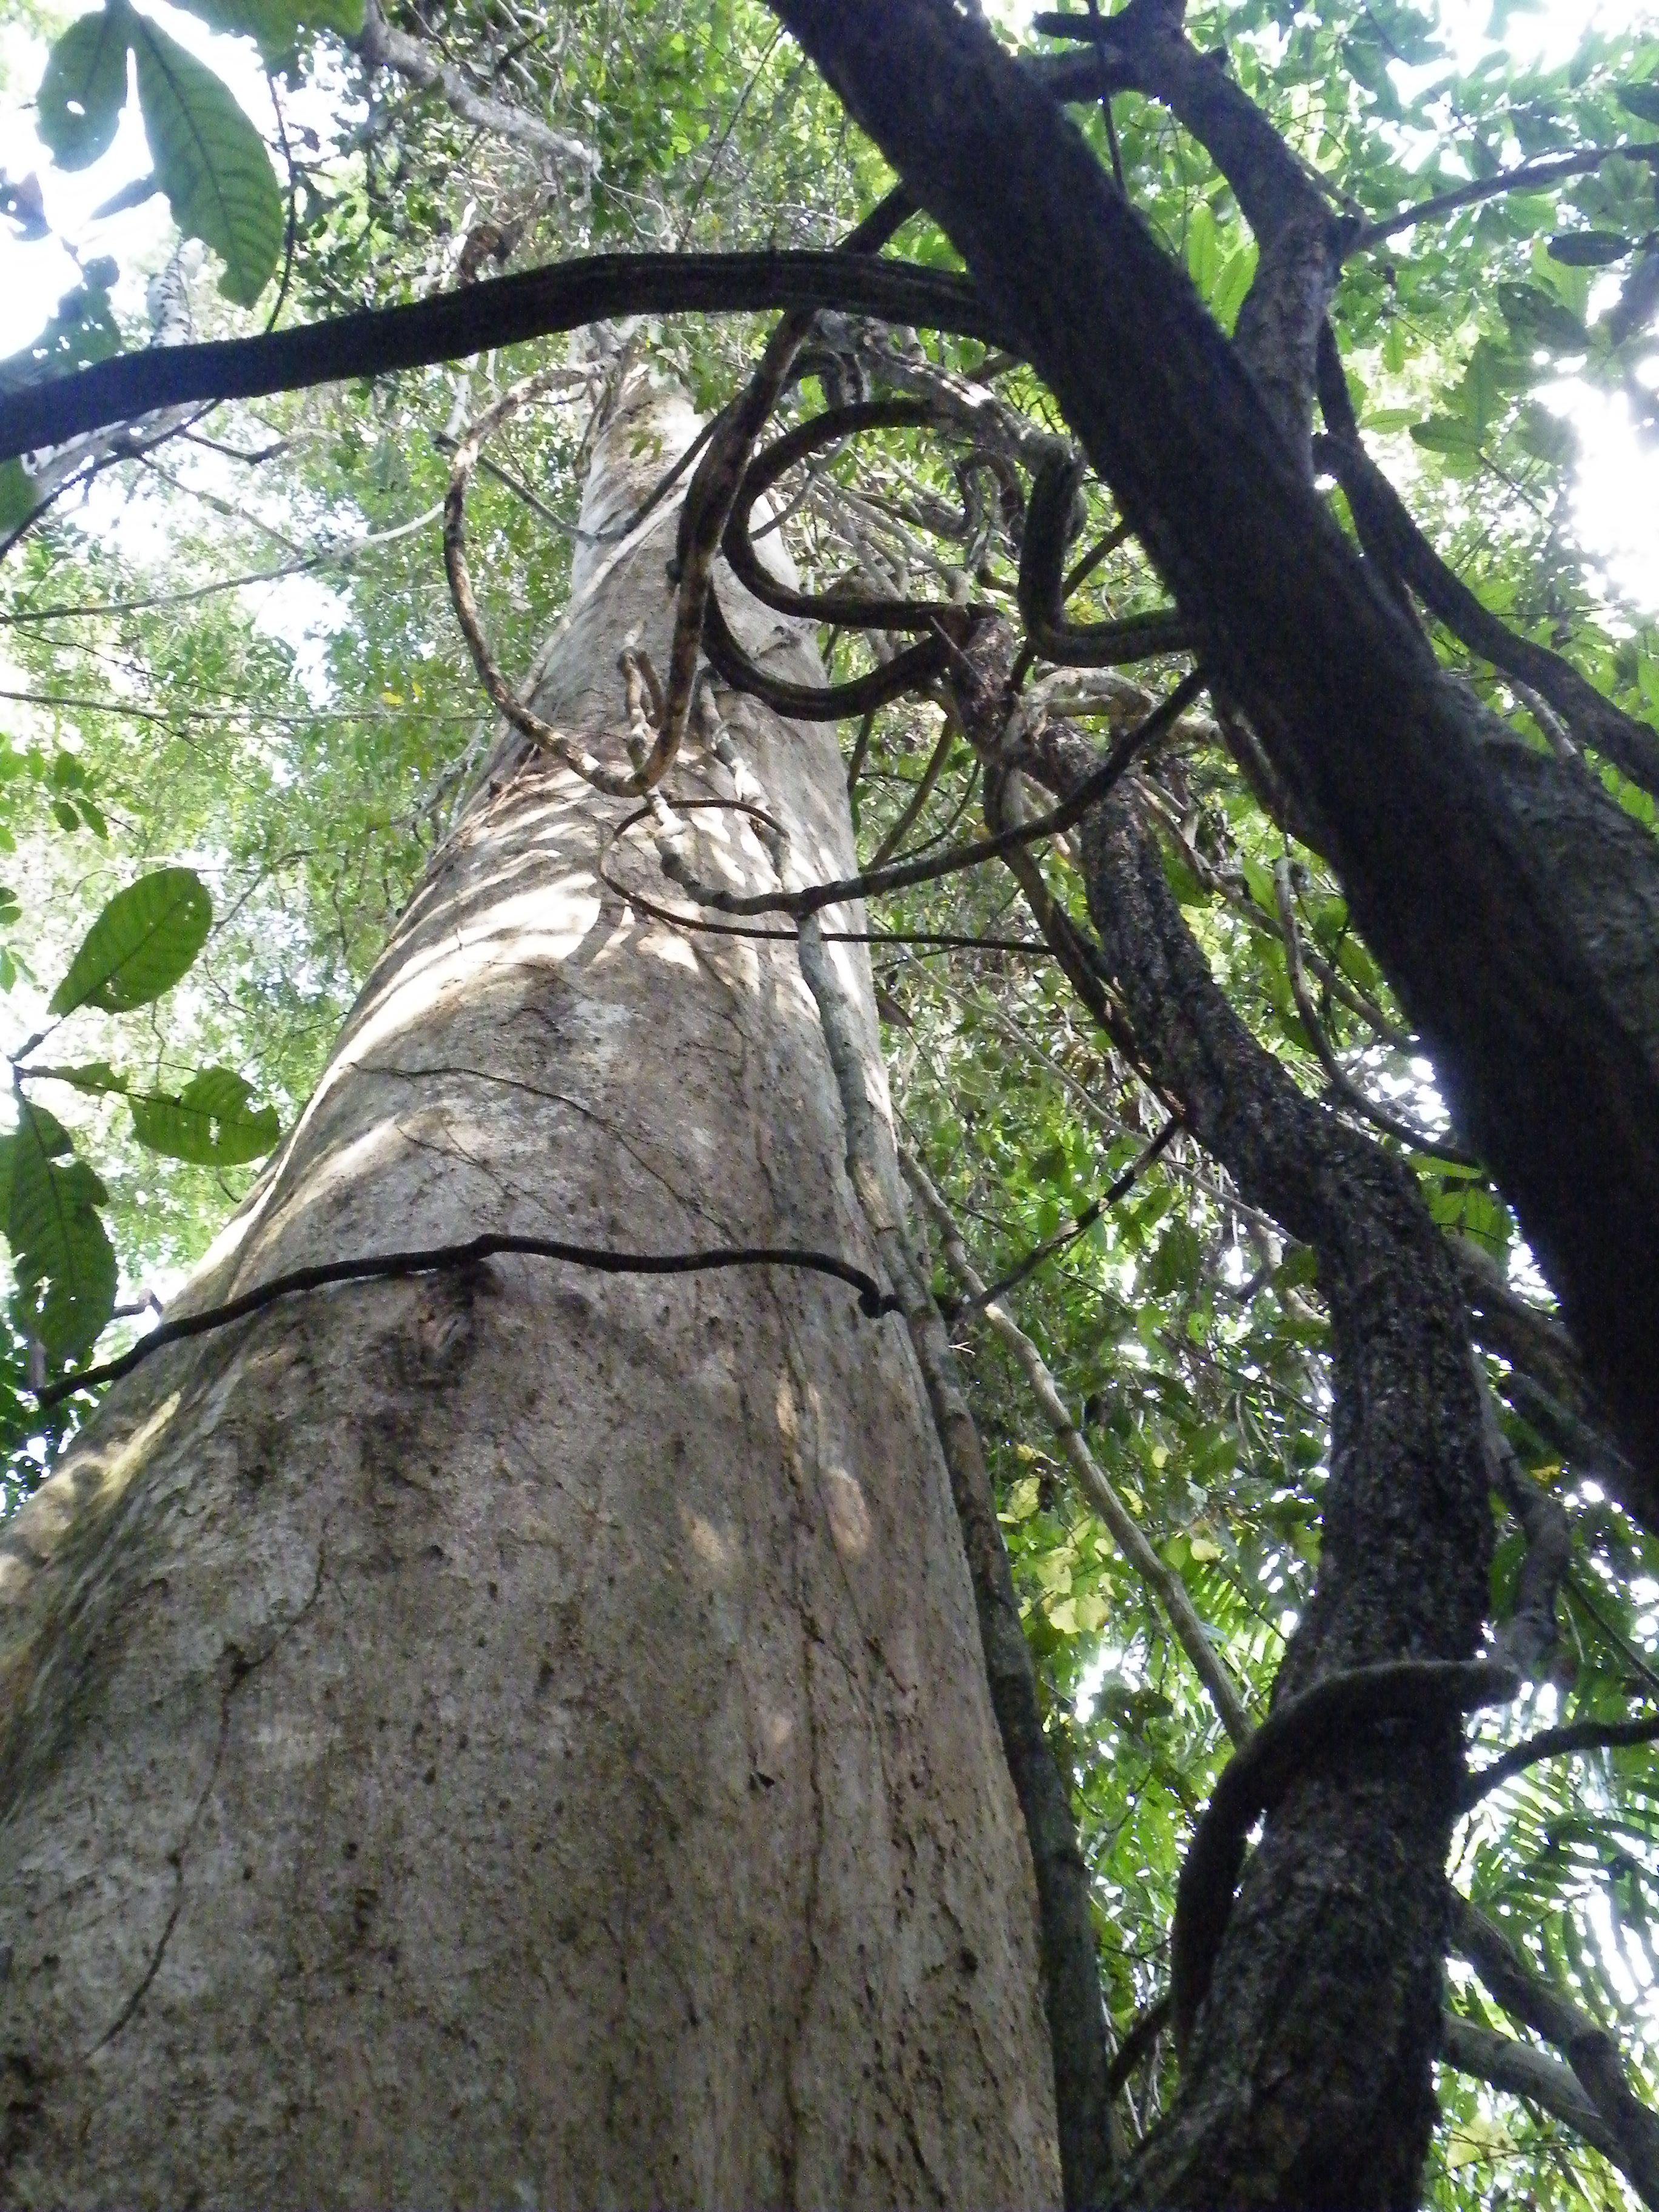 Woudreus in Taman Negara, Maleisie (foto: Dini Reijers)